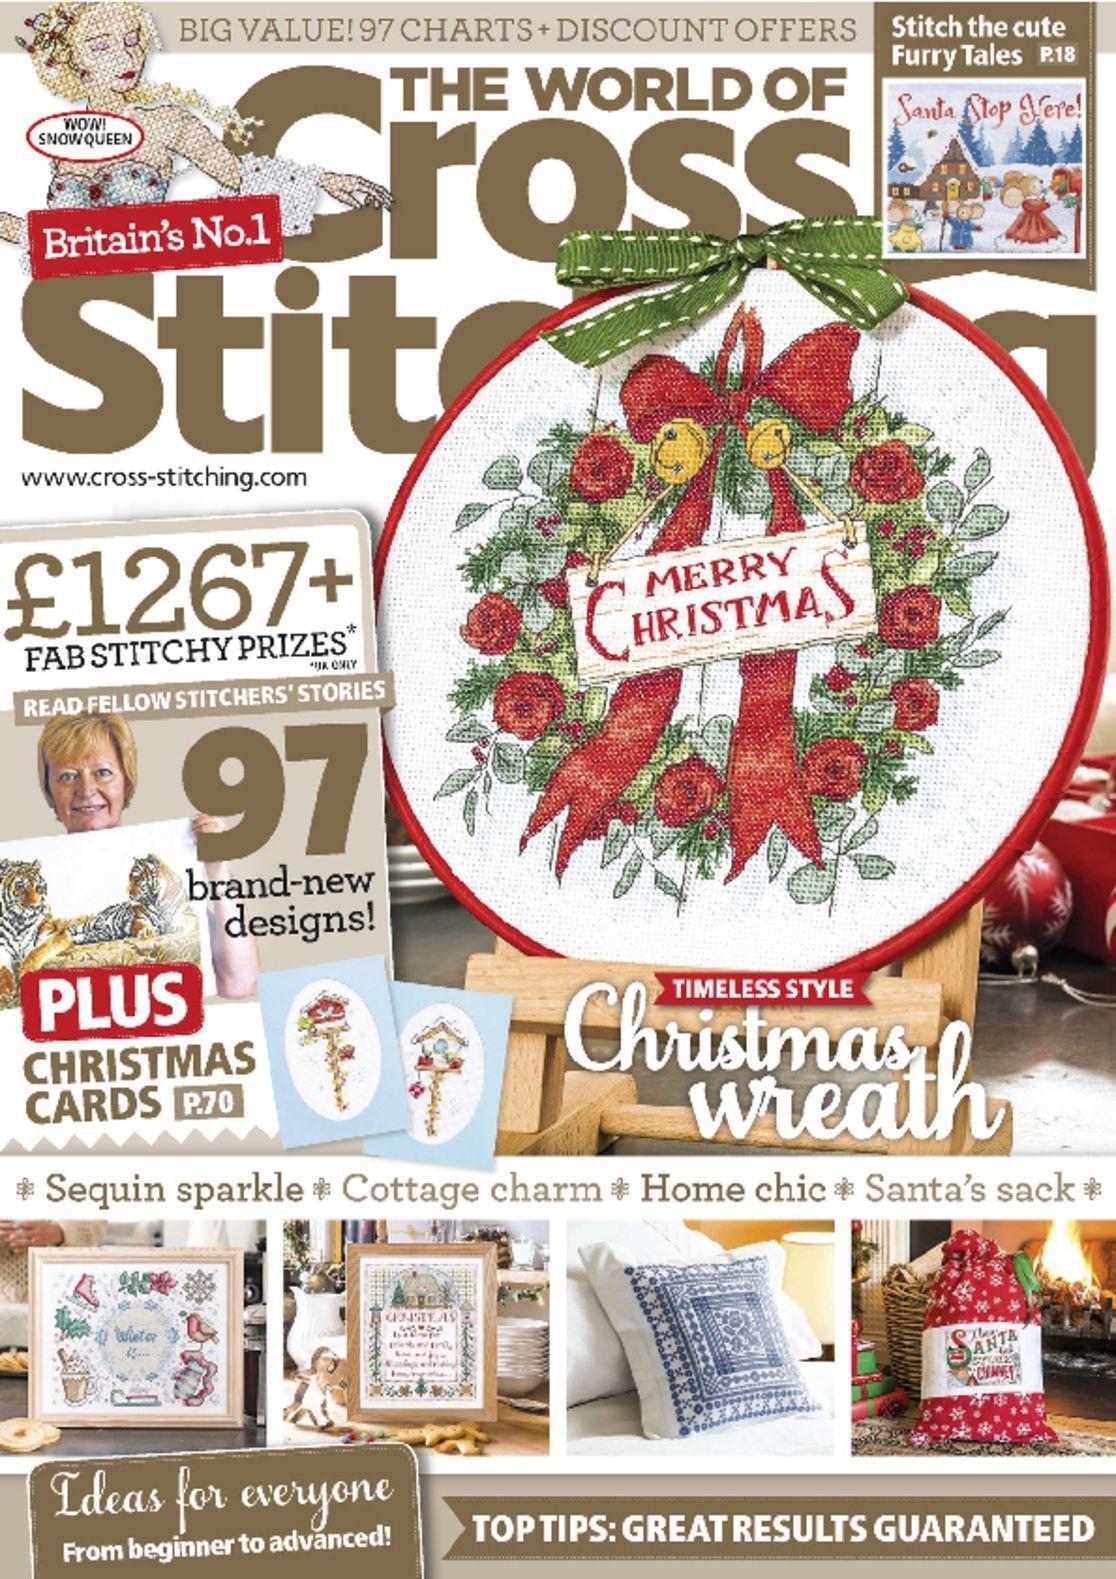 World Of Cross Stitching Christmas 2020 The World of Cross Stitching Magazine Subscription (Digital) in